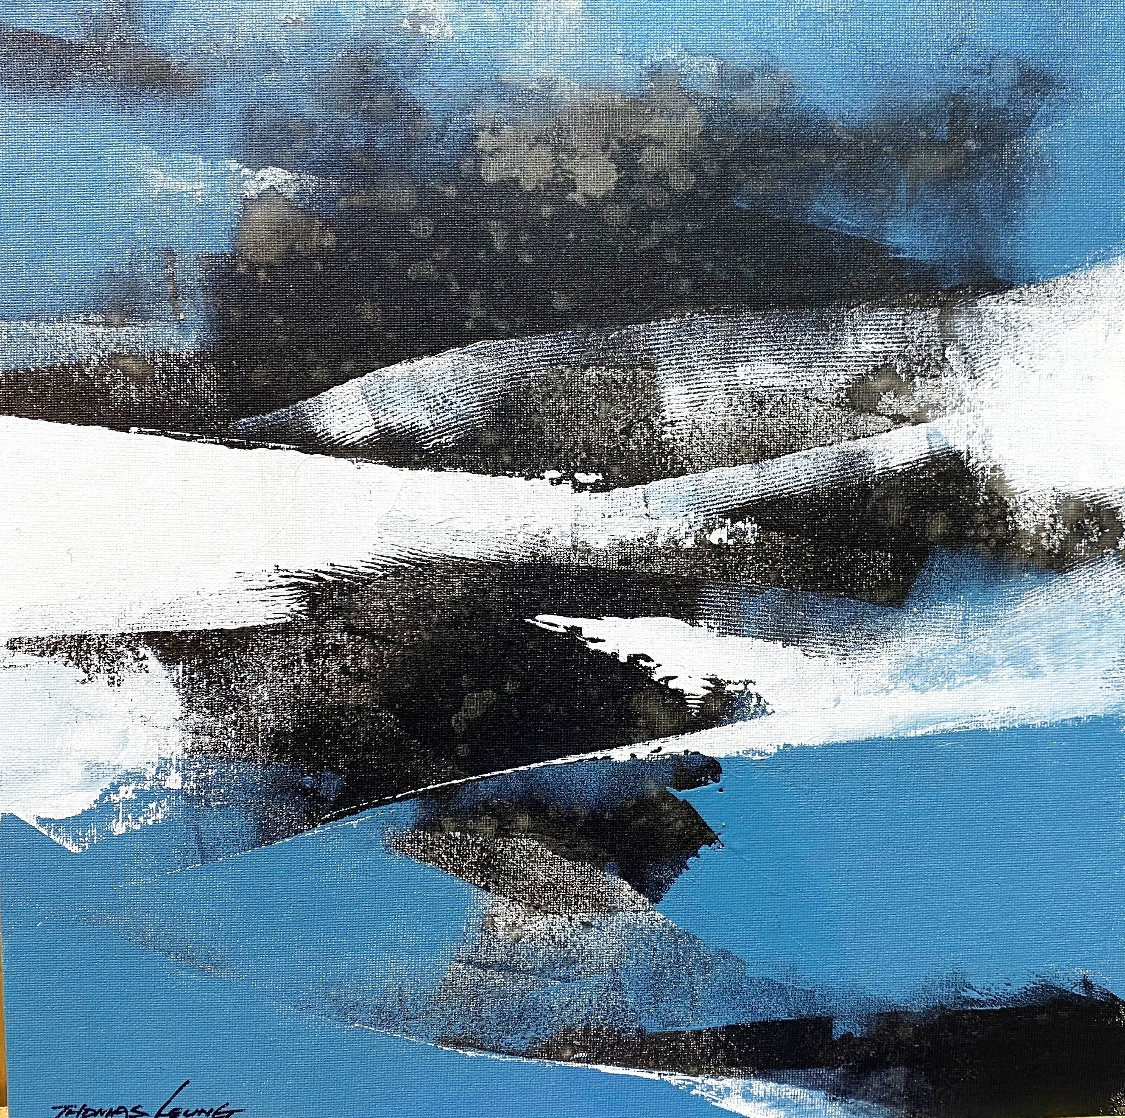 Wave 17 2020 16x16 Original Painting by Thomas Leung